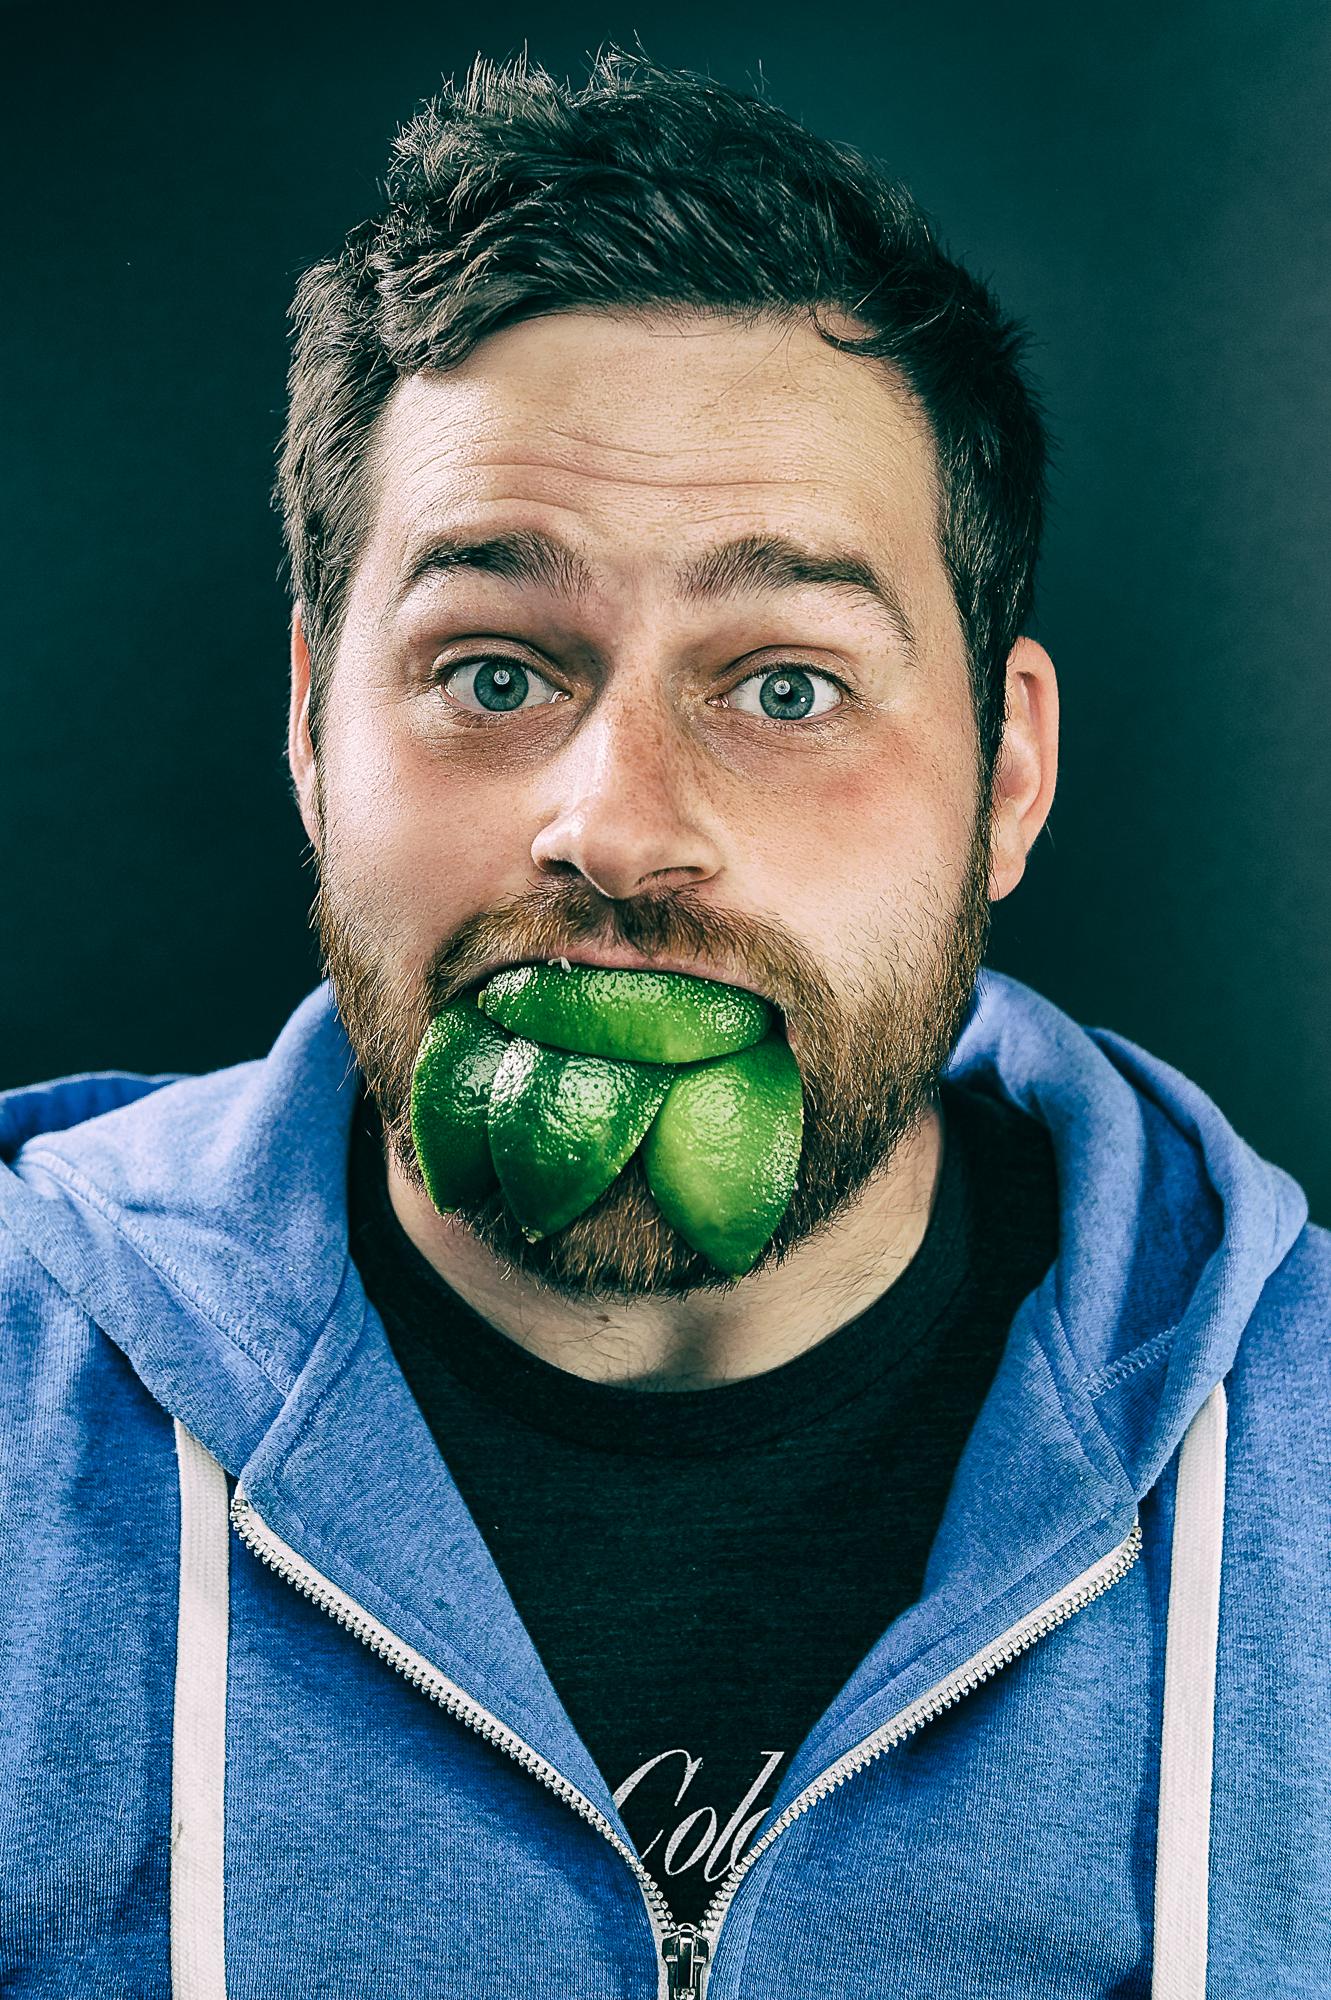 Limes-10.jpg